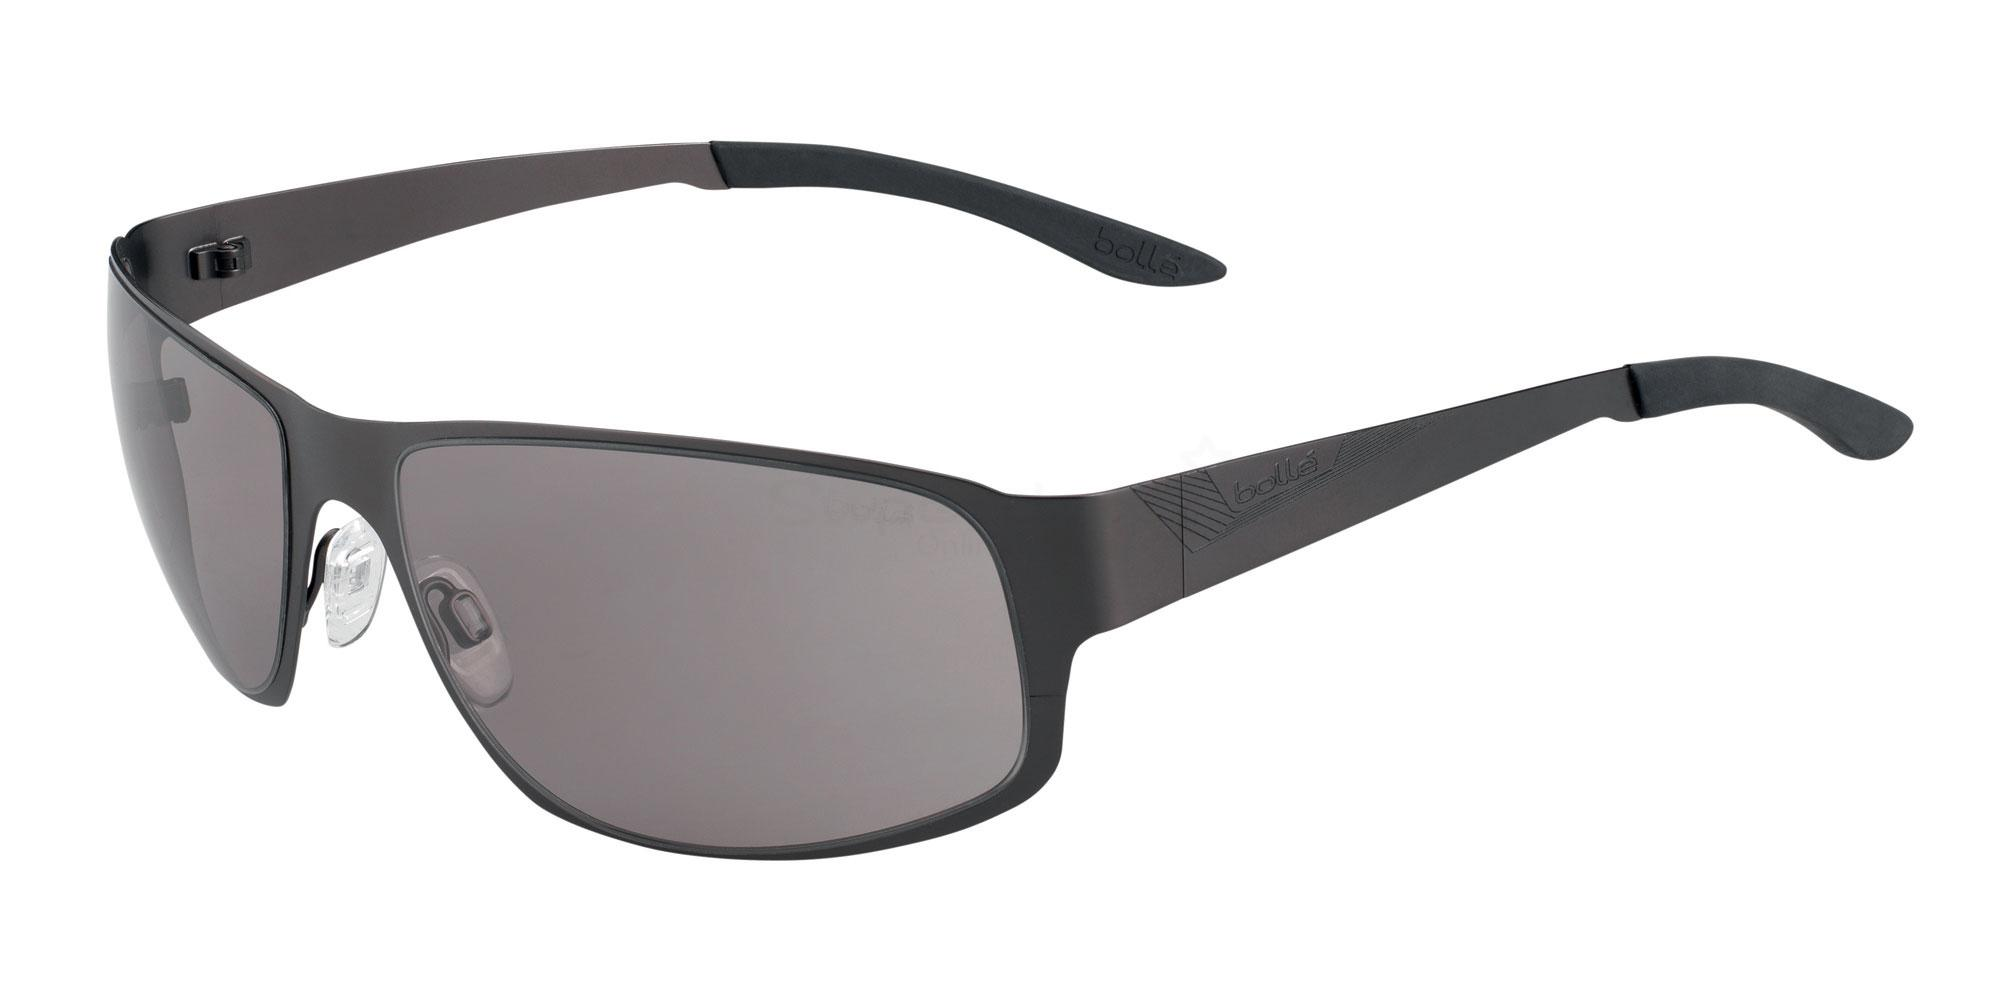 12235 Auckland Sunglasses, Bolle